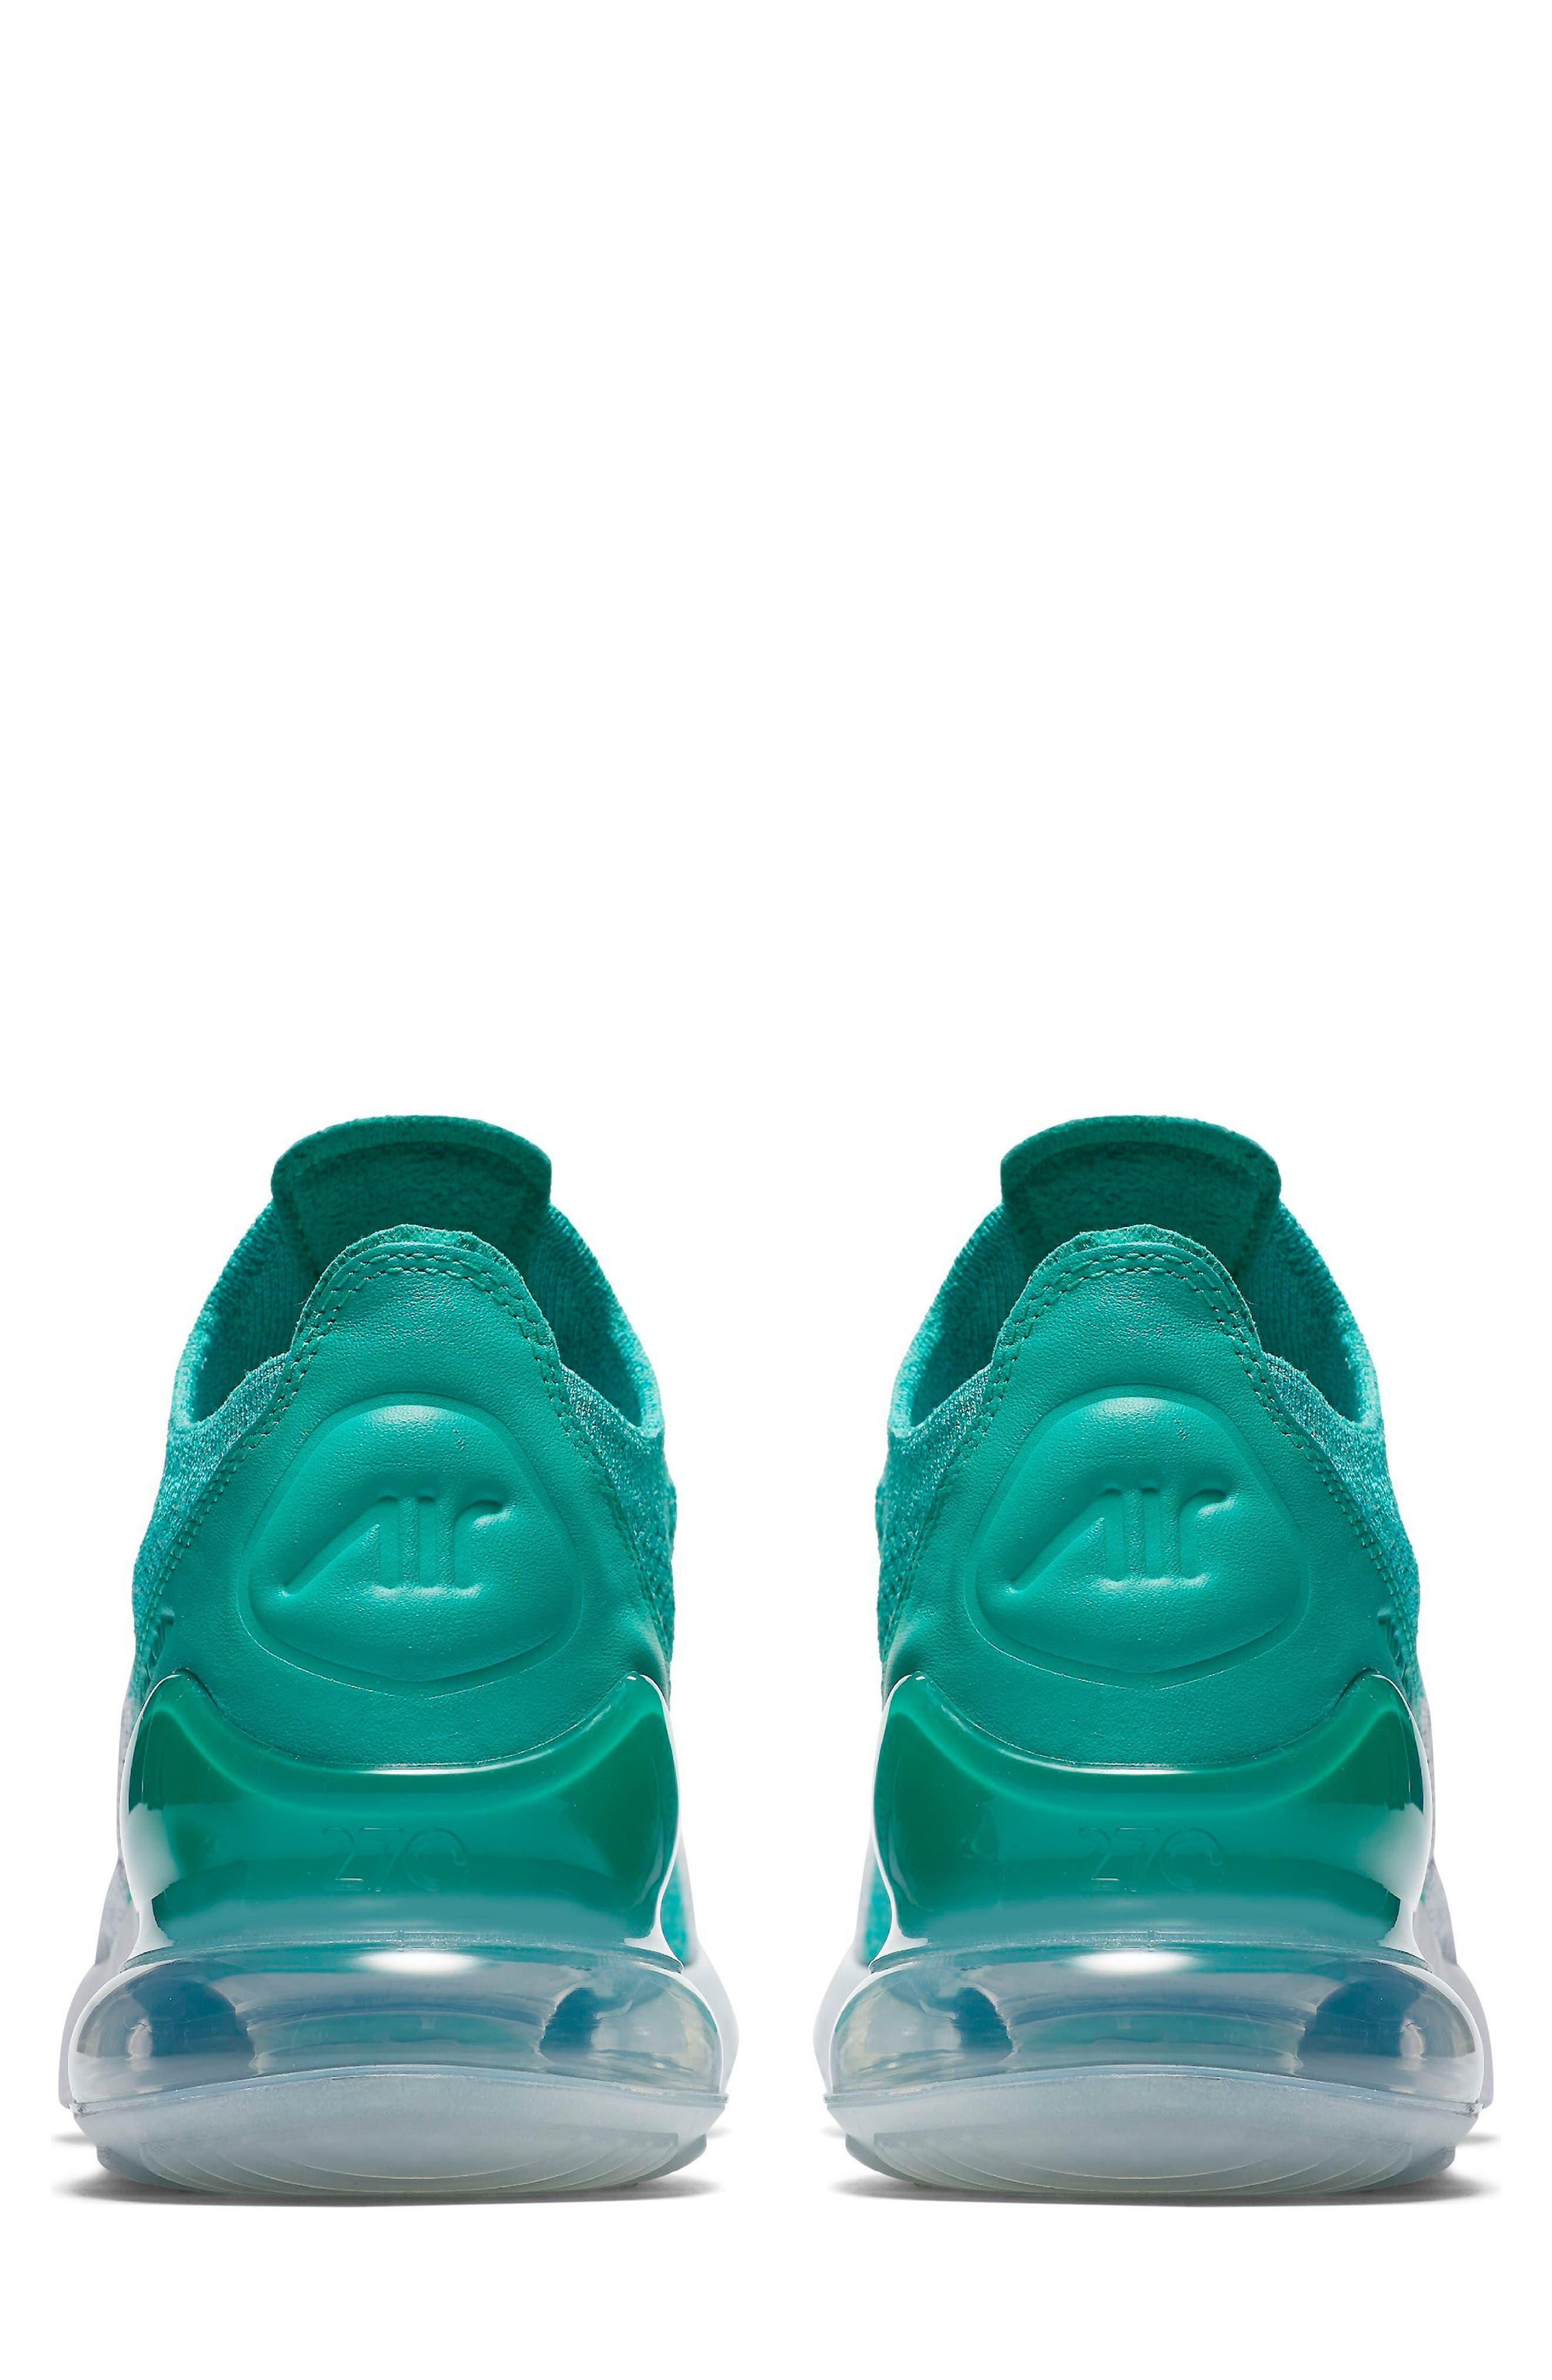 Air Max 270 Flyknit Sneaker,                             Alternate thumbnail 2, color,                             EMERALD/ BLACK/ PURE PLATINUM